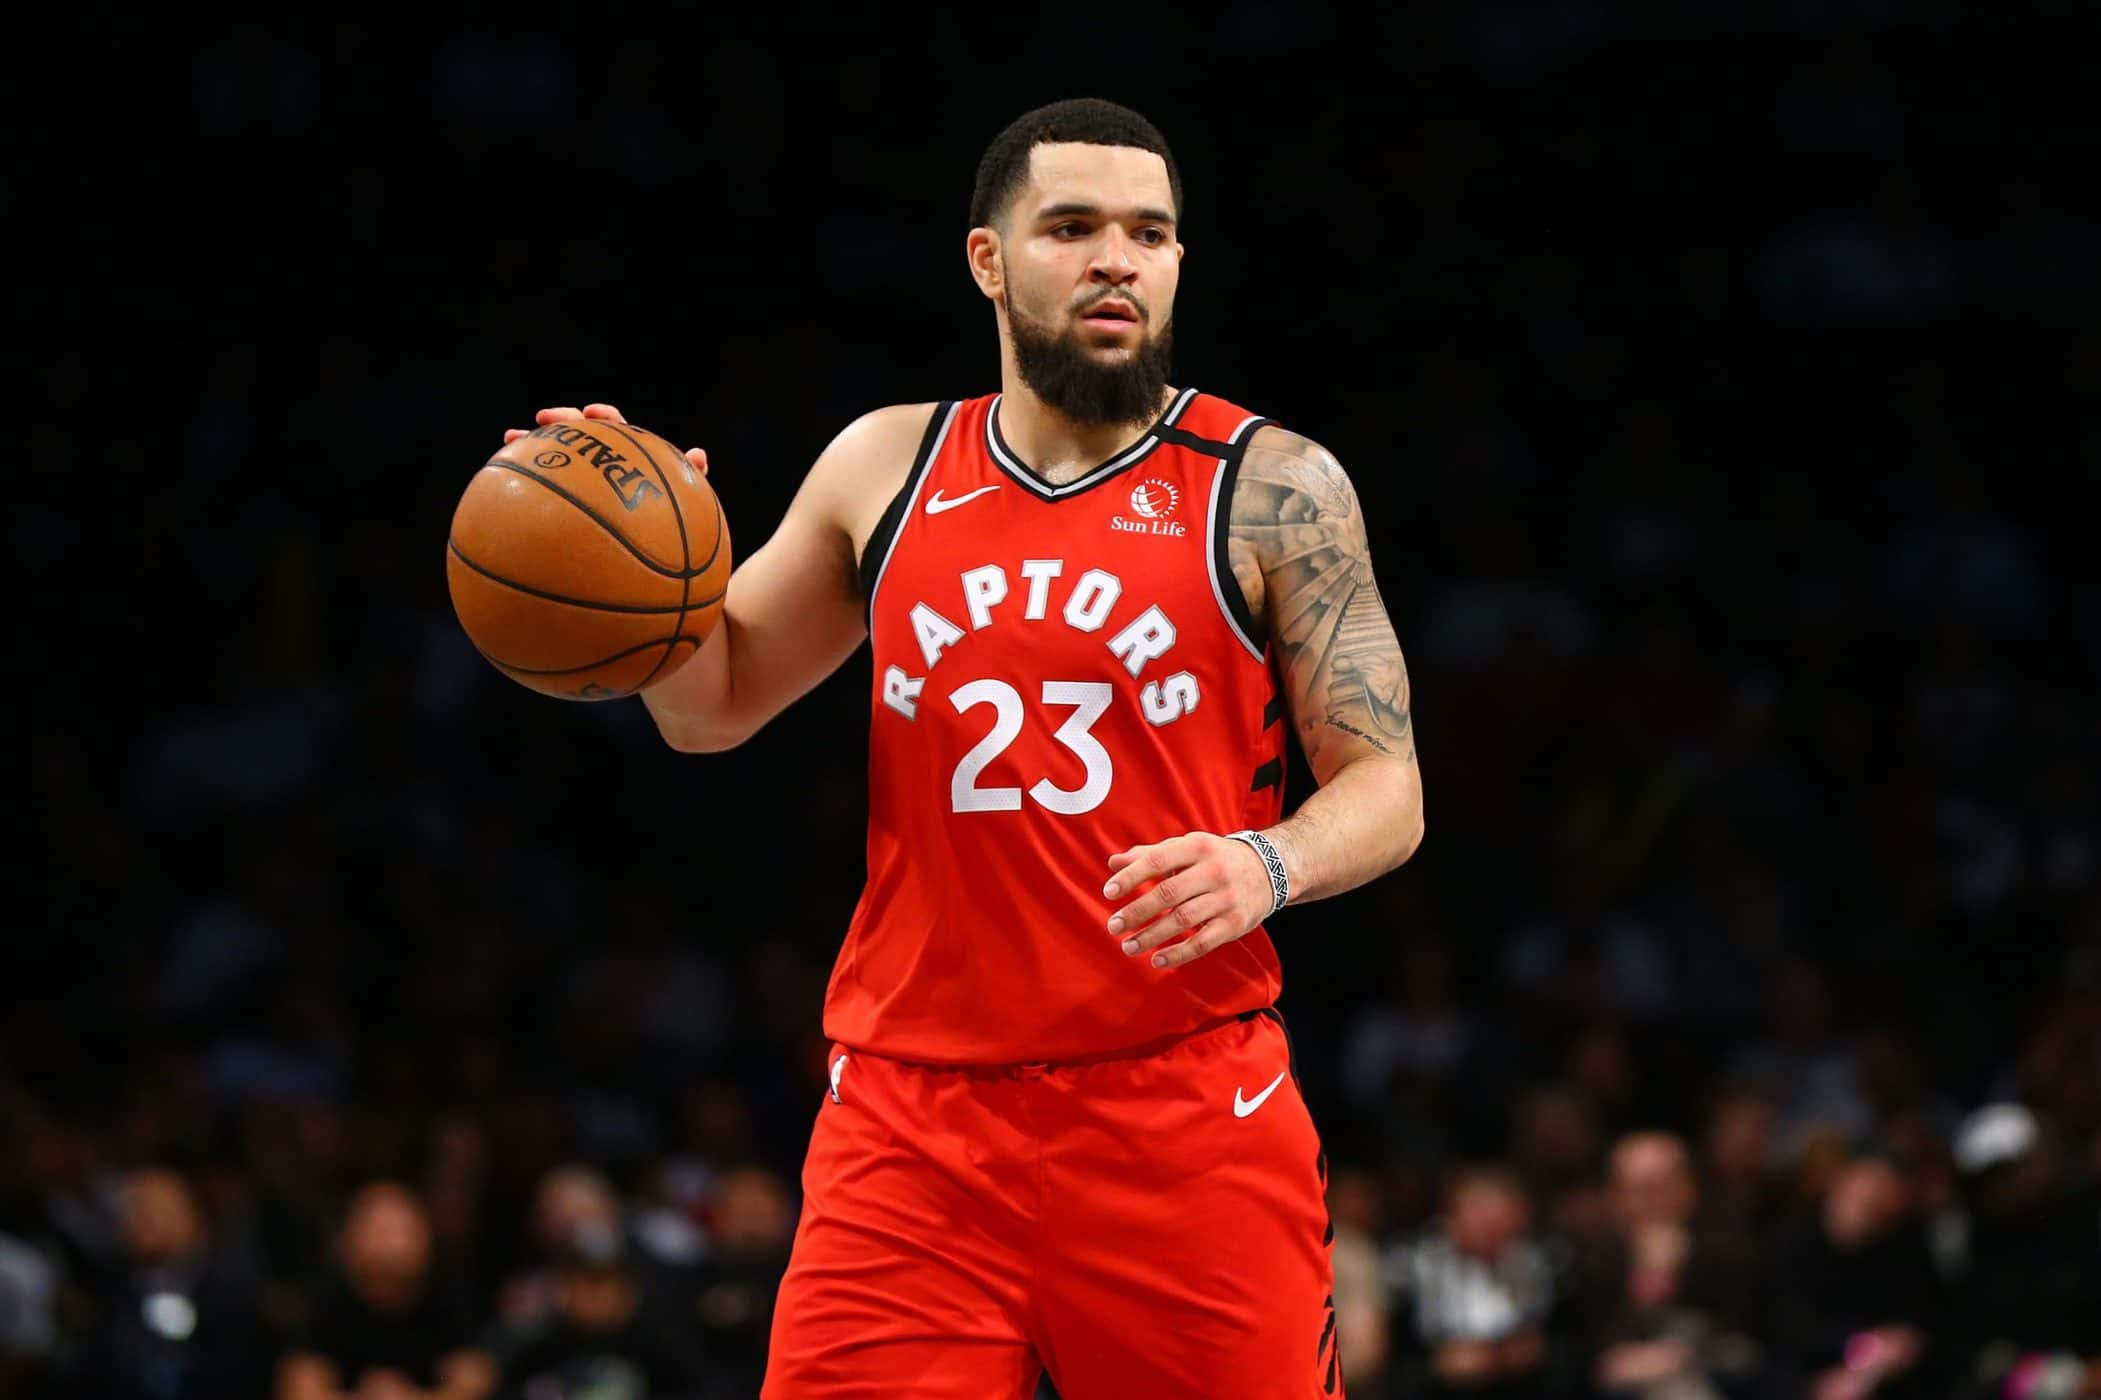 Toronto Raptors: 5 mosse per rimanere nell'elitè